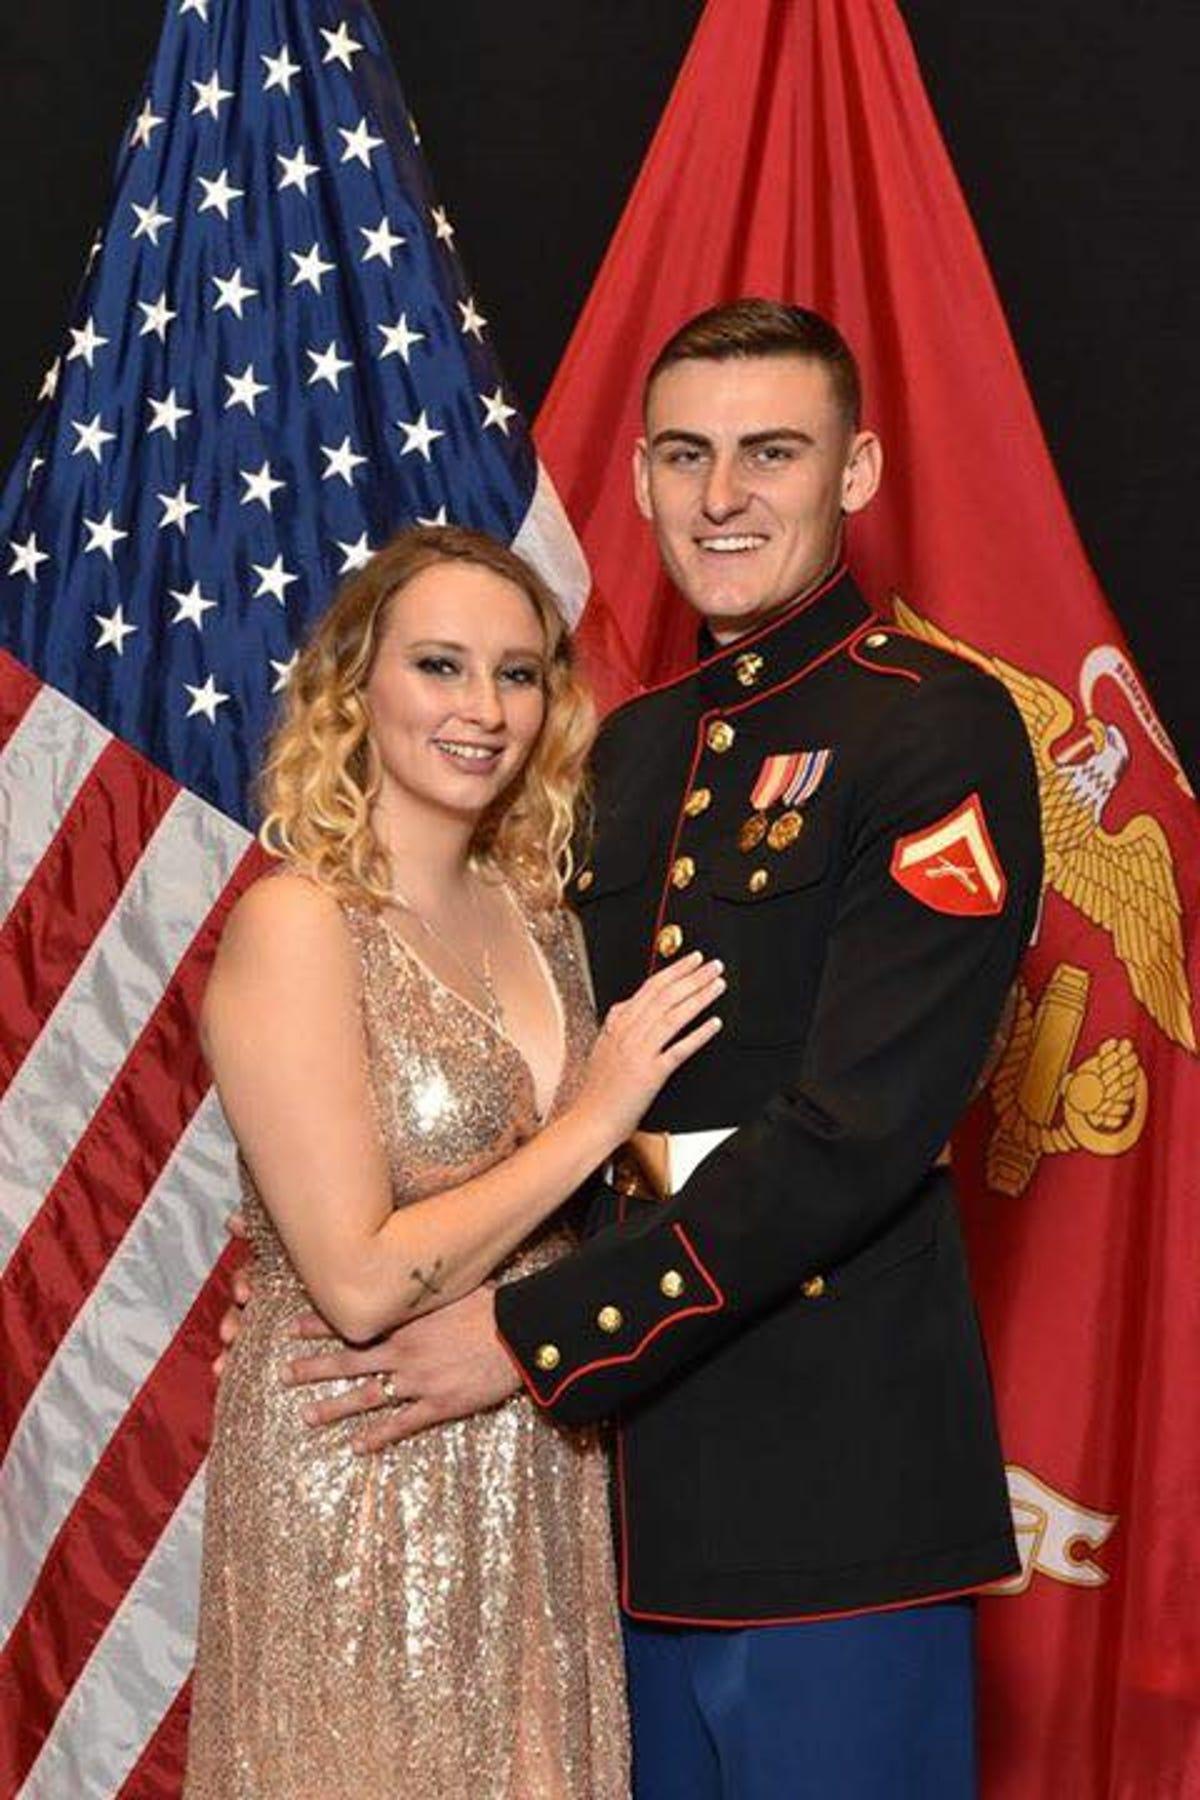 Logan Parkhurst, Marine from Greece, killed in crash in San Diego